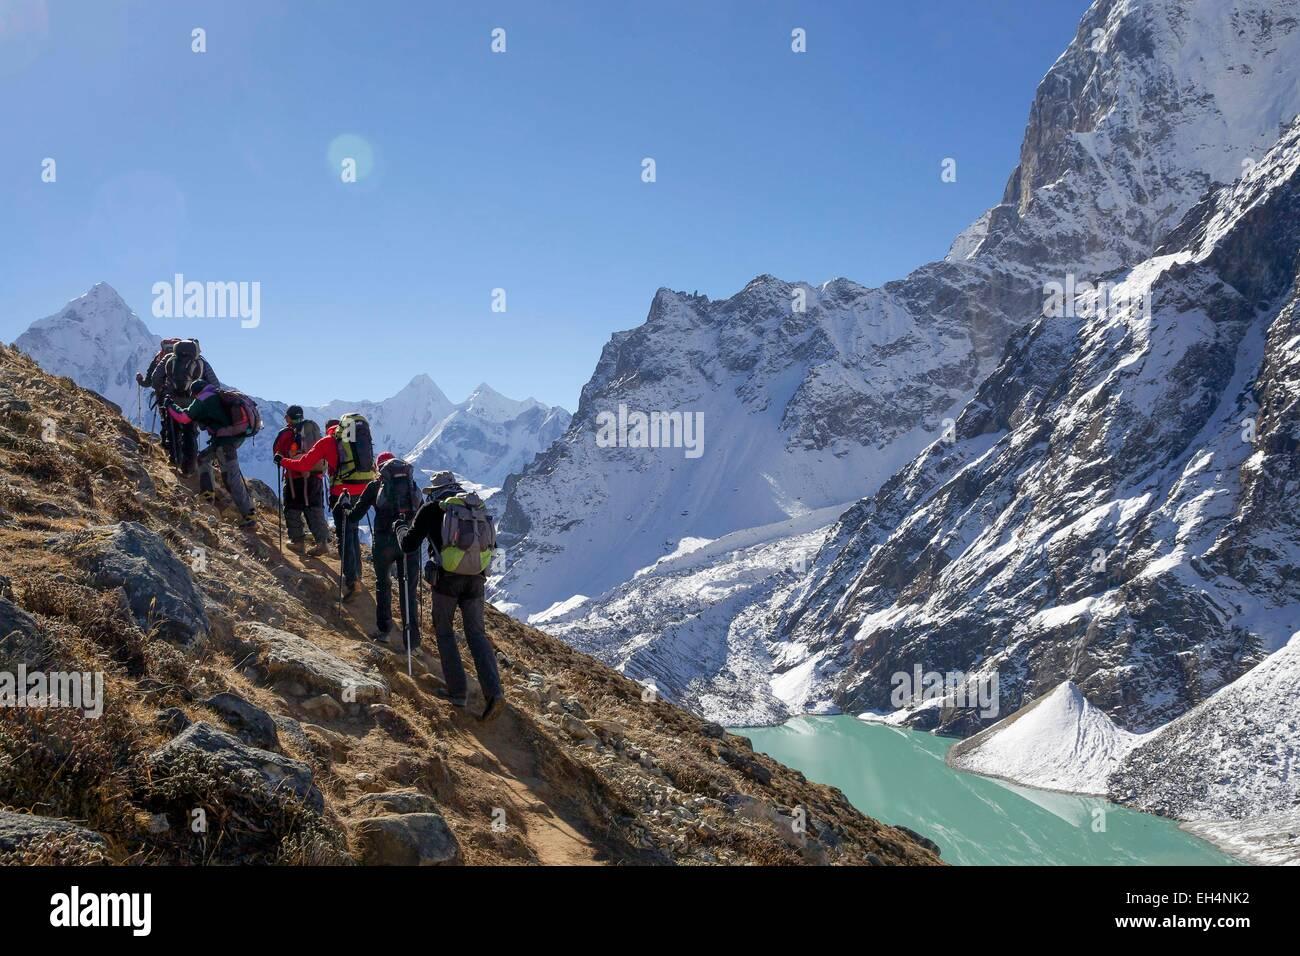 Nepal, Sagarmatha National Park, listed as World Heritage by UNESCO, Solu Khumbu District, hikers near Cholatse - Stock Image